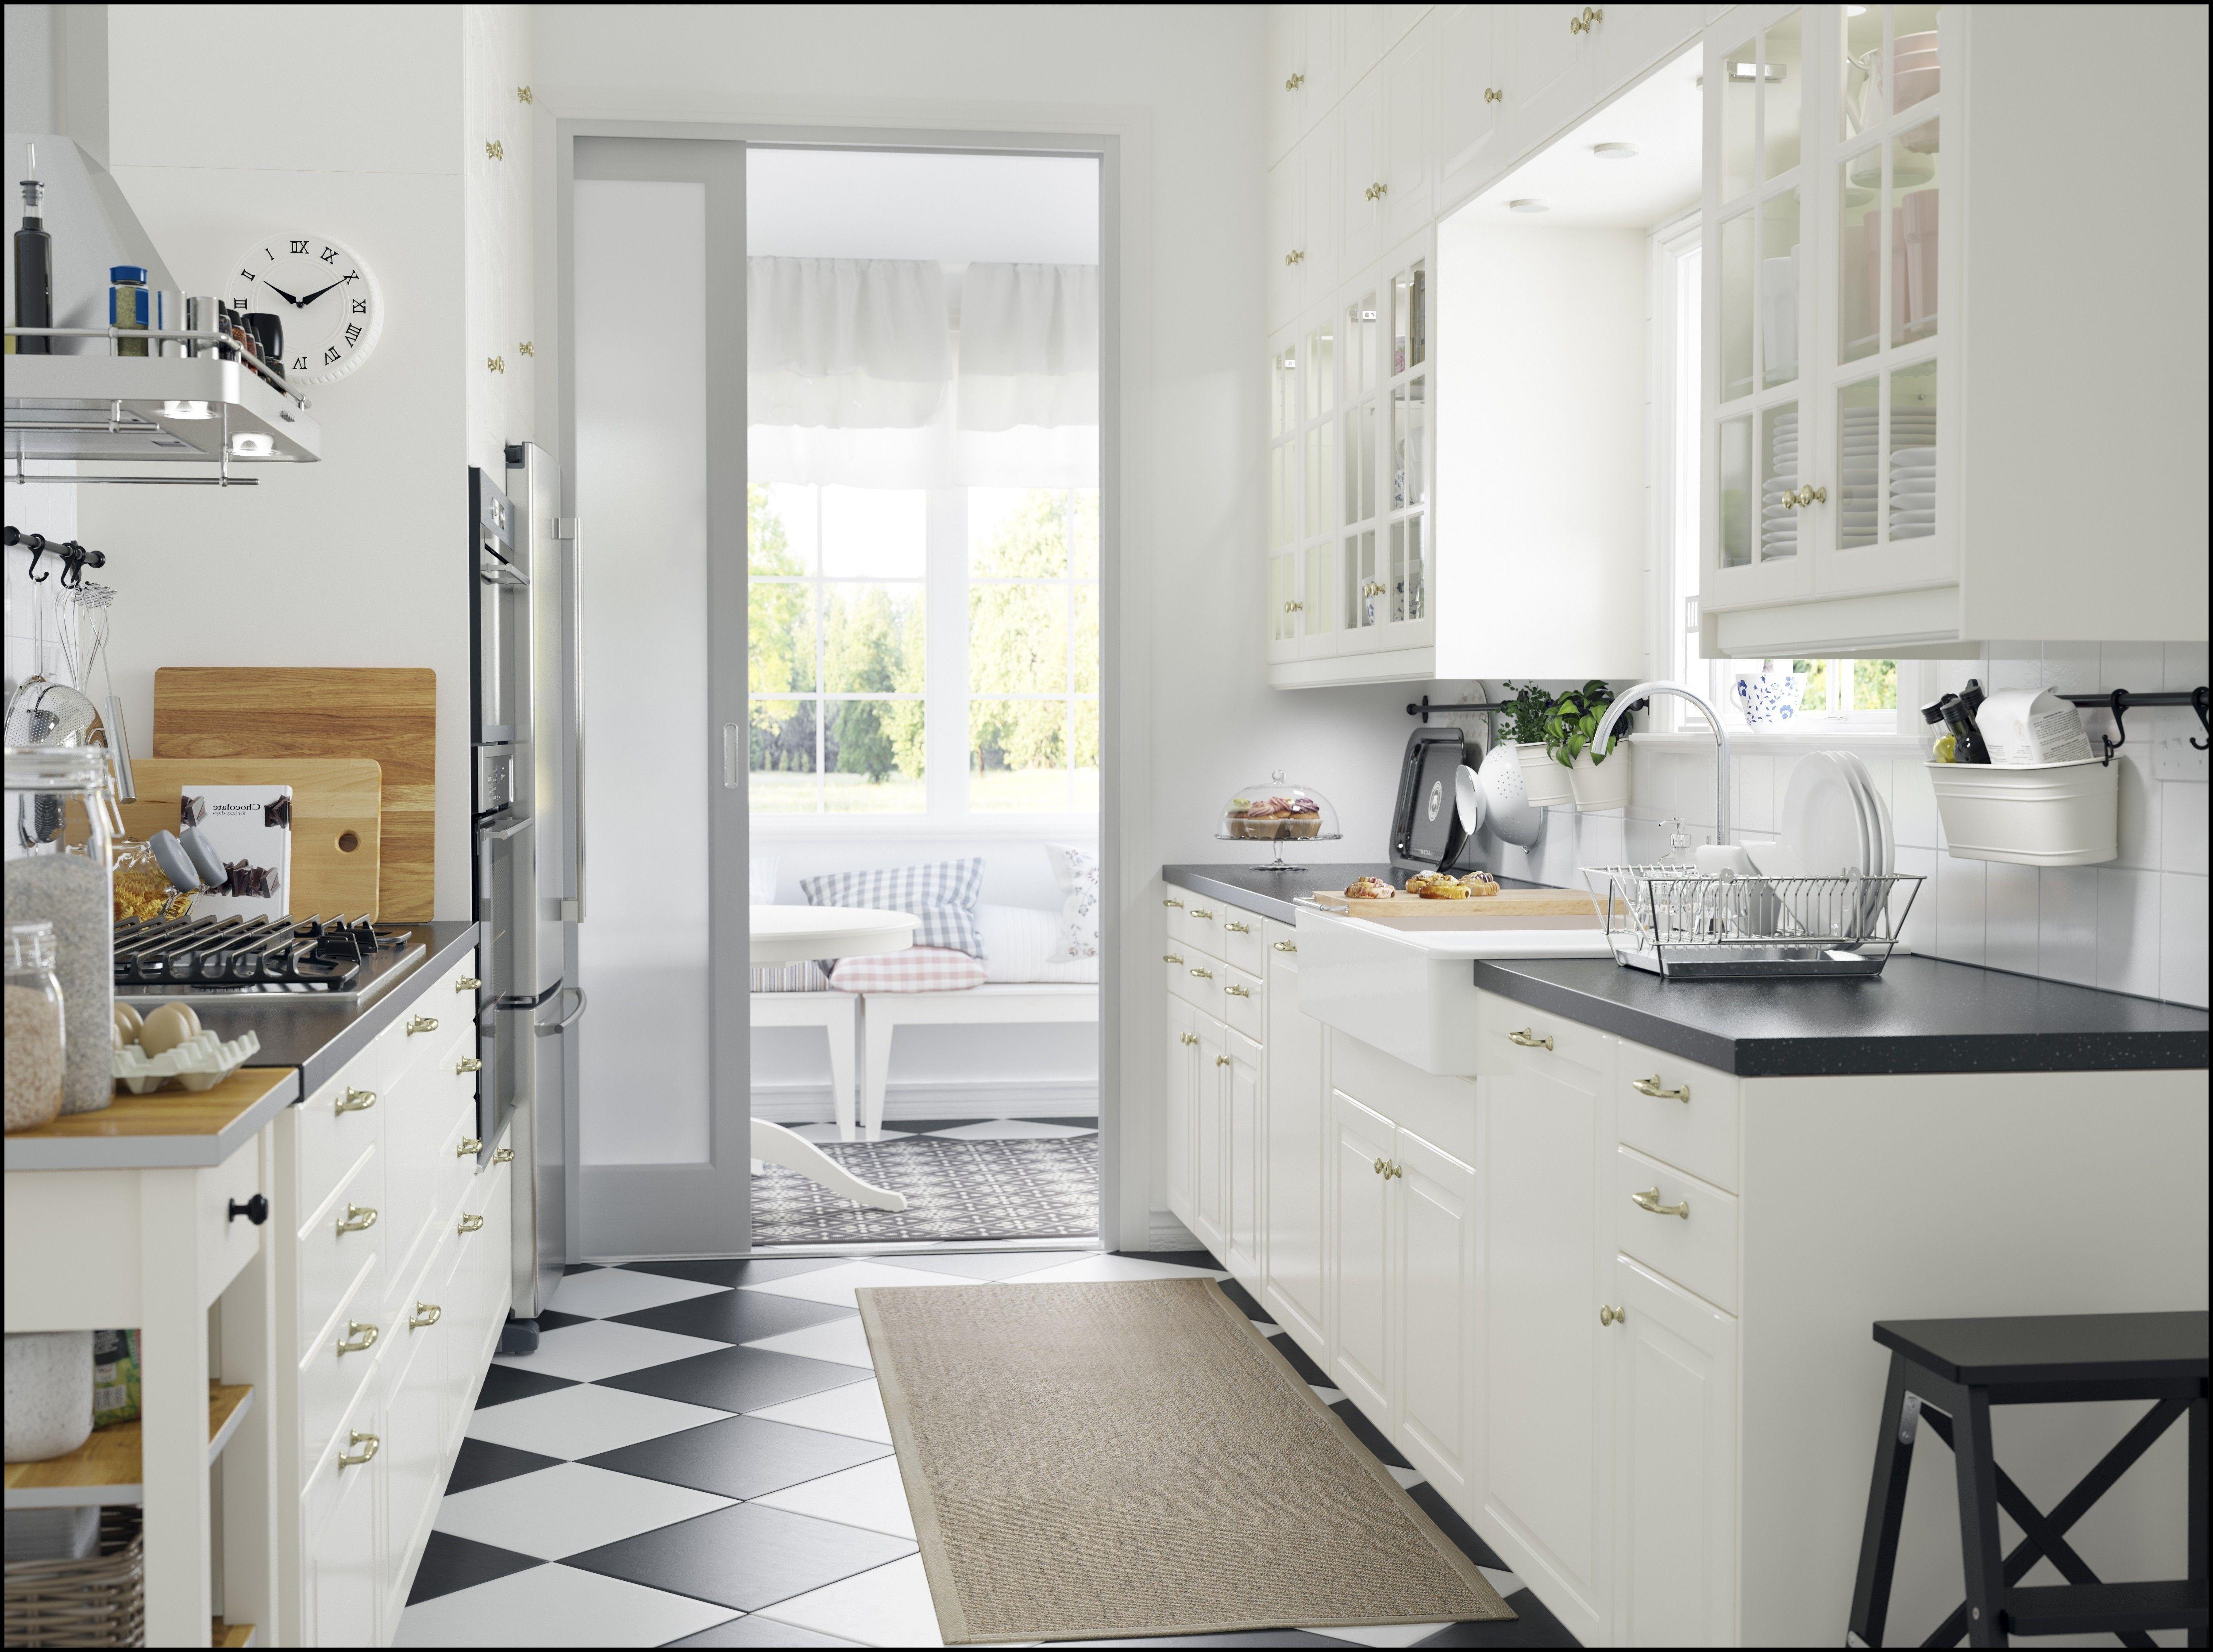 Kuche Landhausstil Ikea Arzummoda In 2020 Decor Home Decor Design